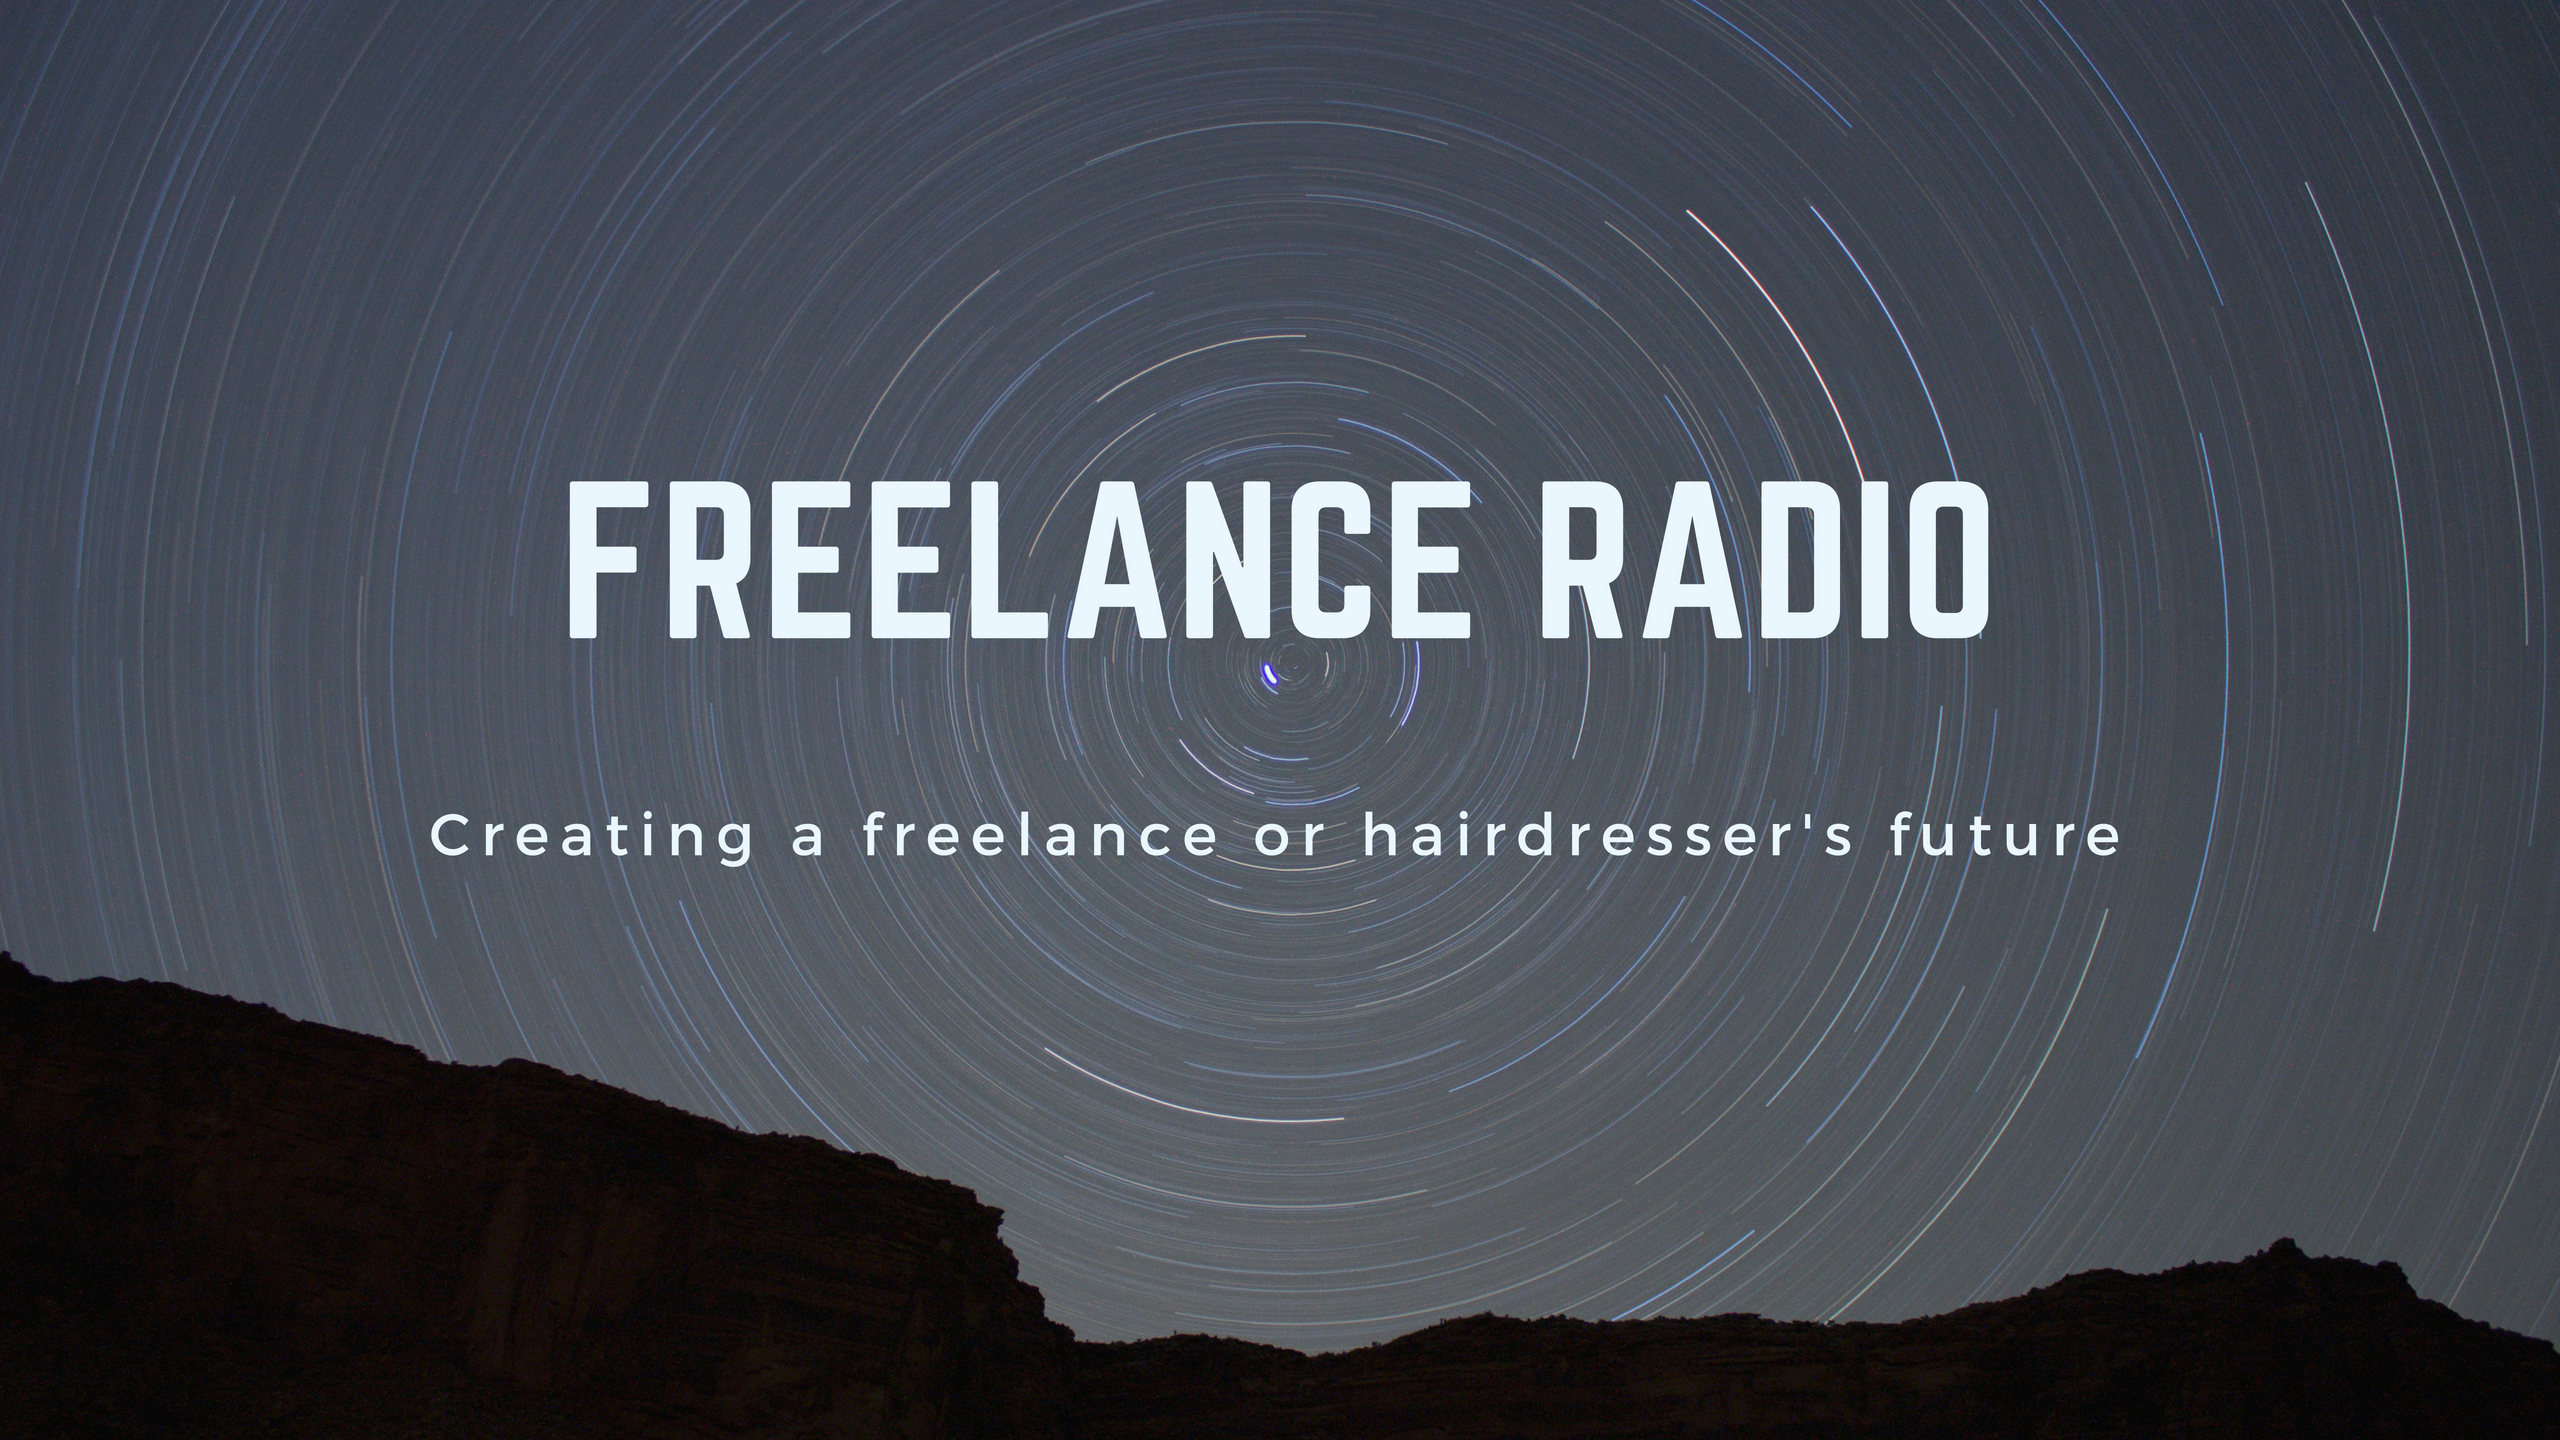 freelanceradio